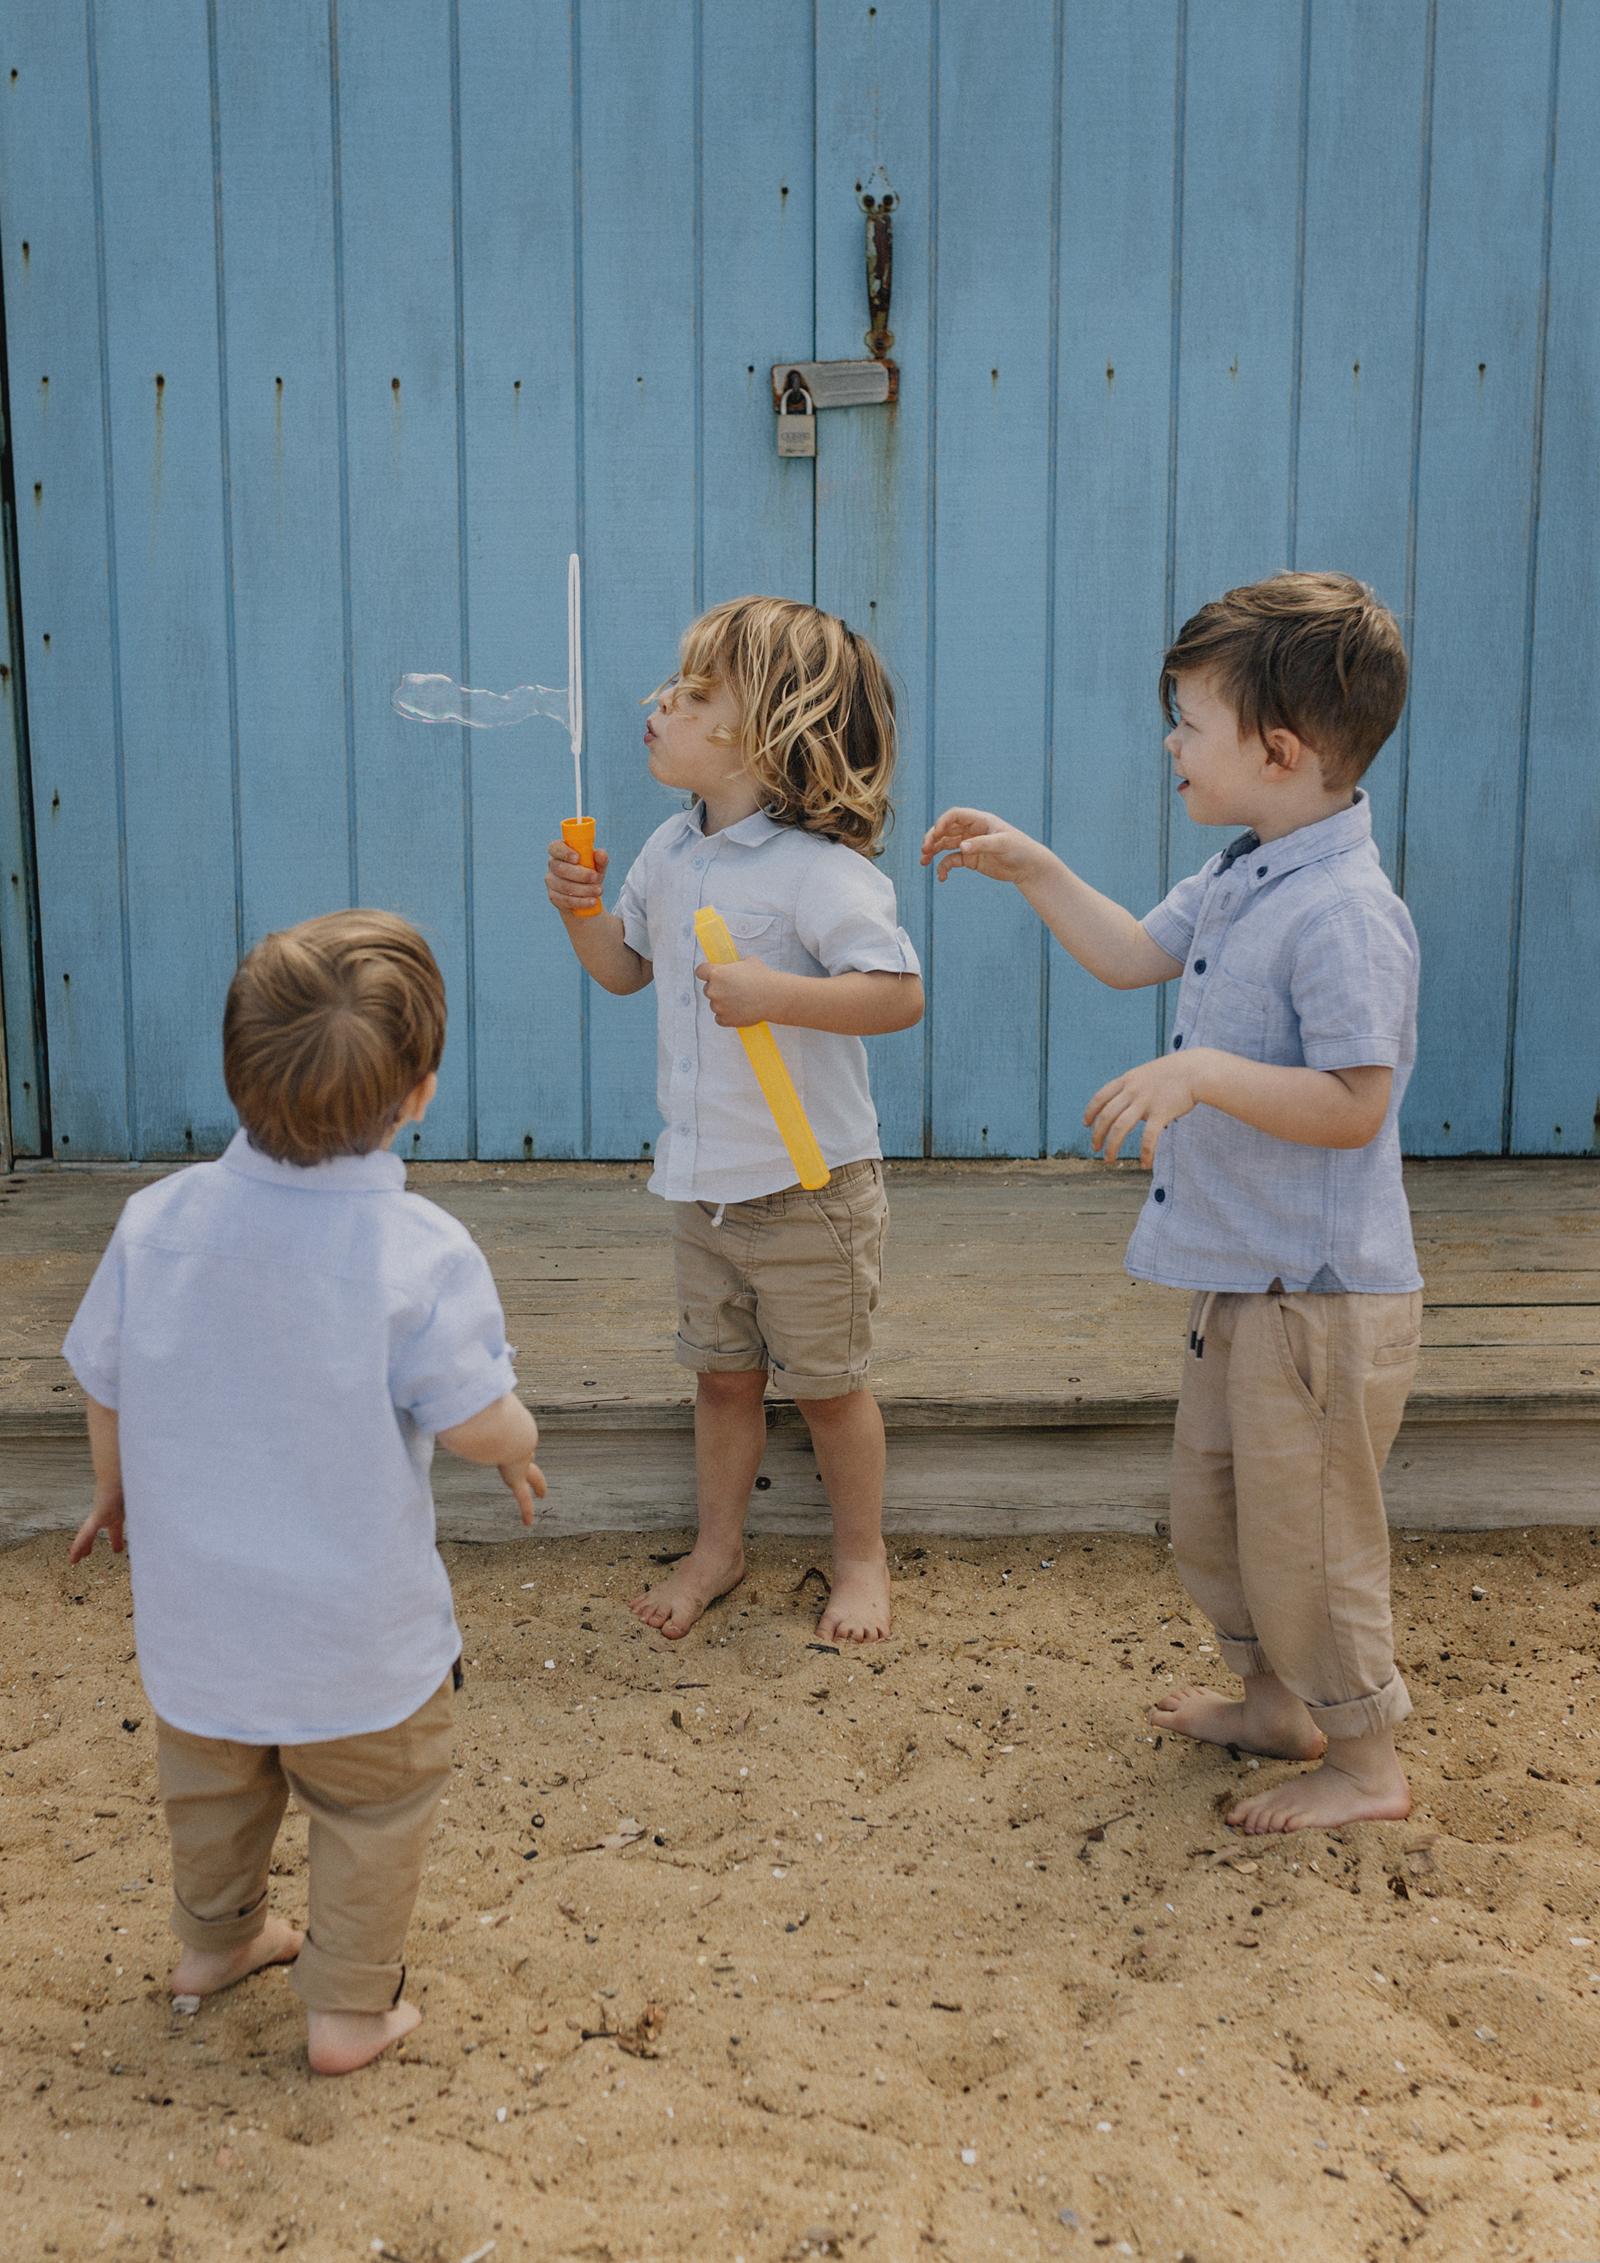 Cousins having fun blowing bubbles at the beach